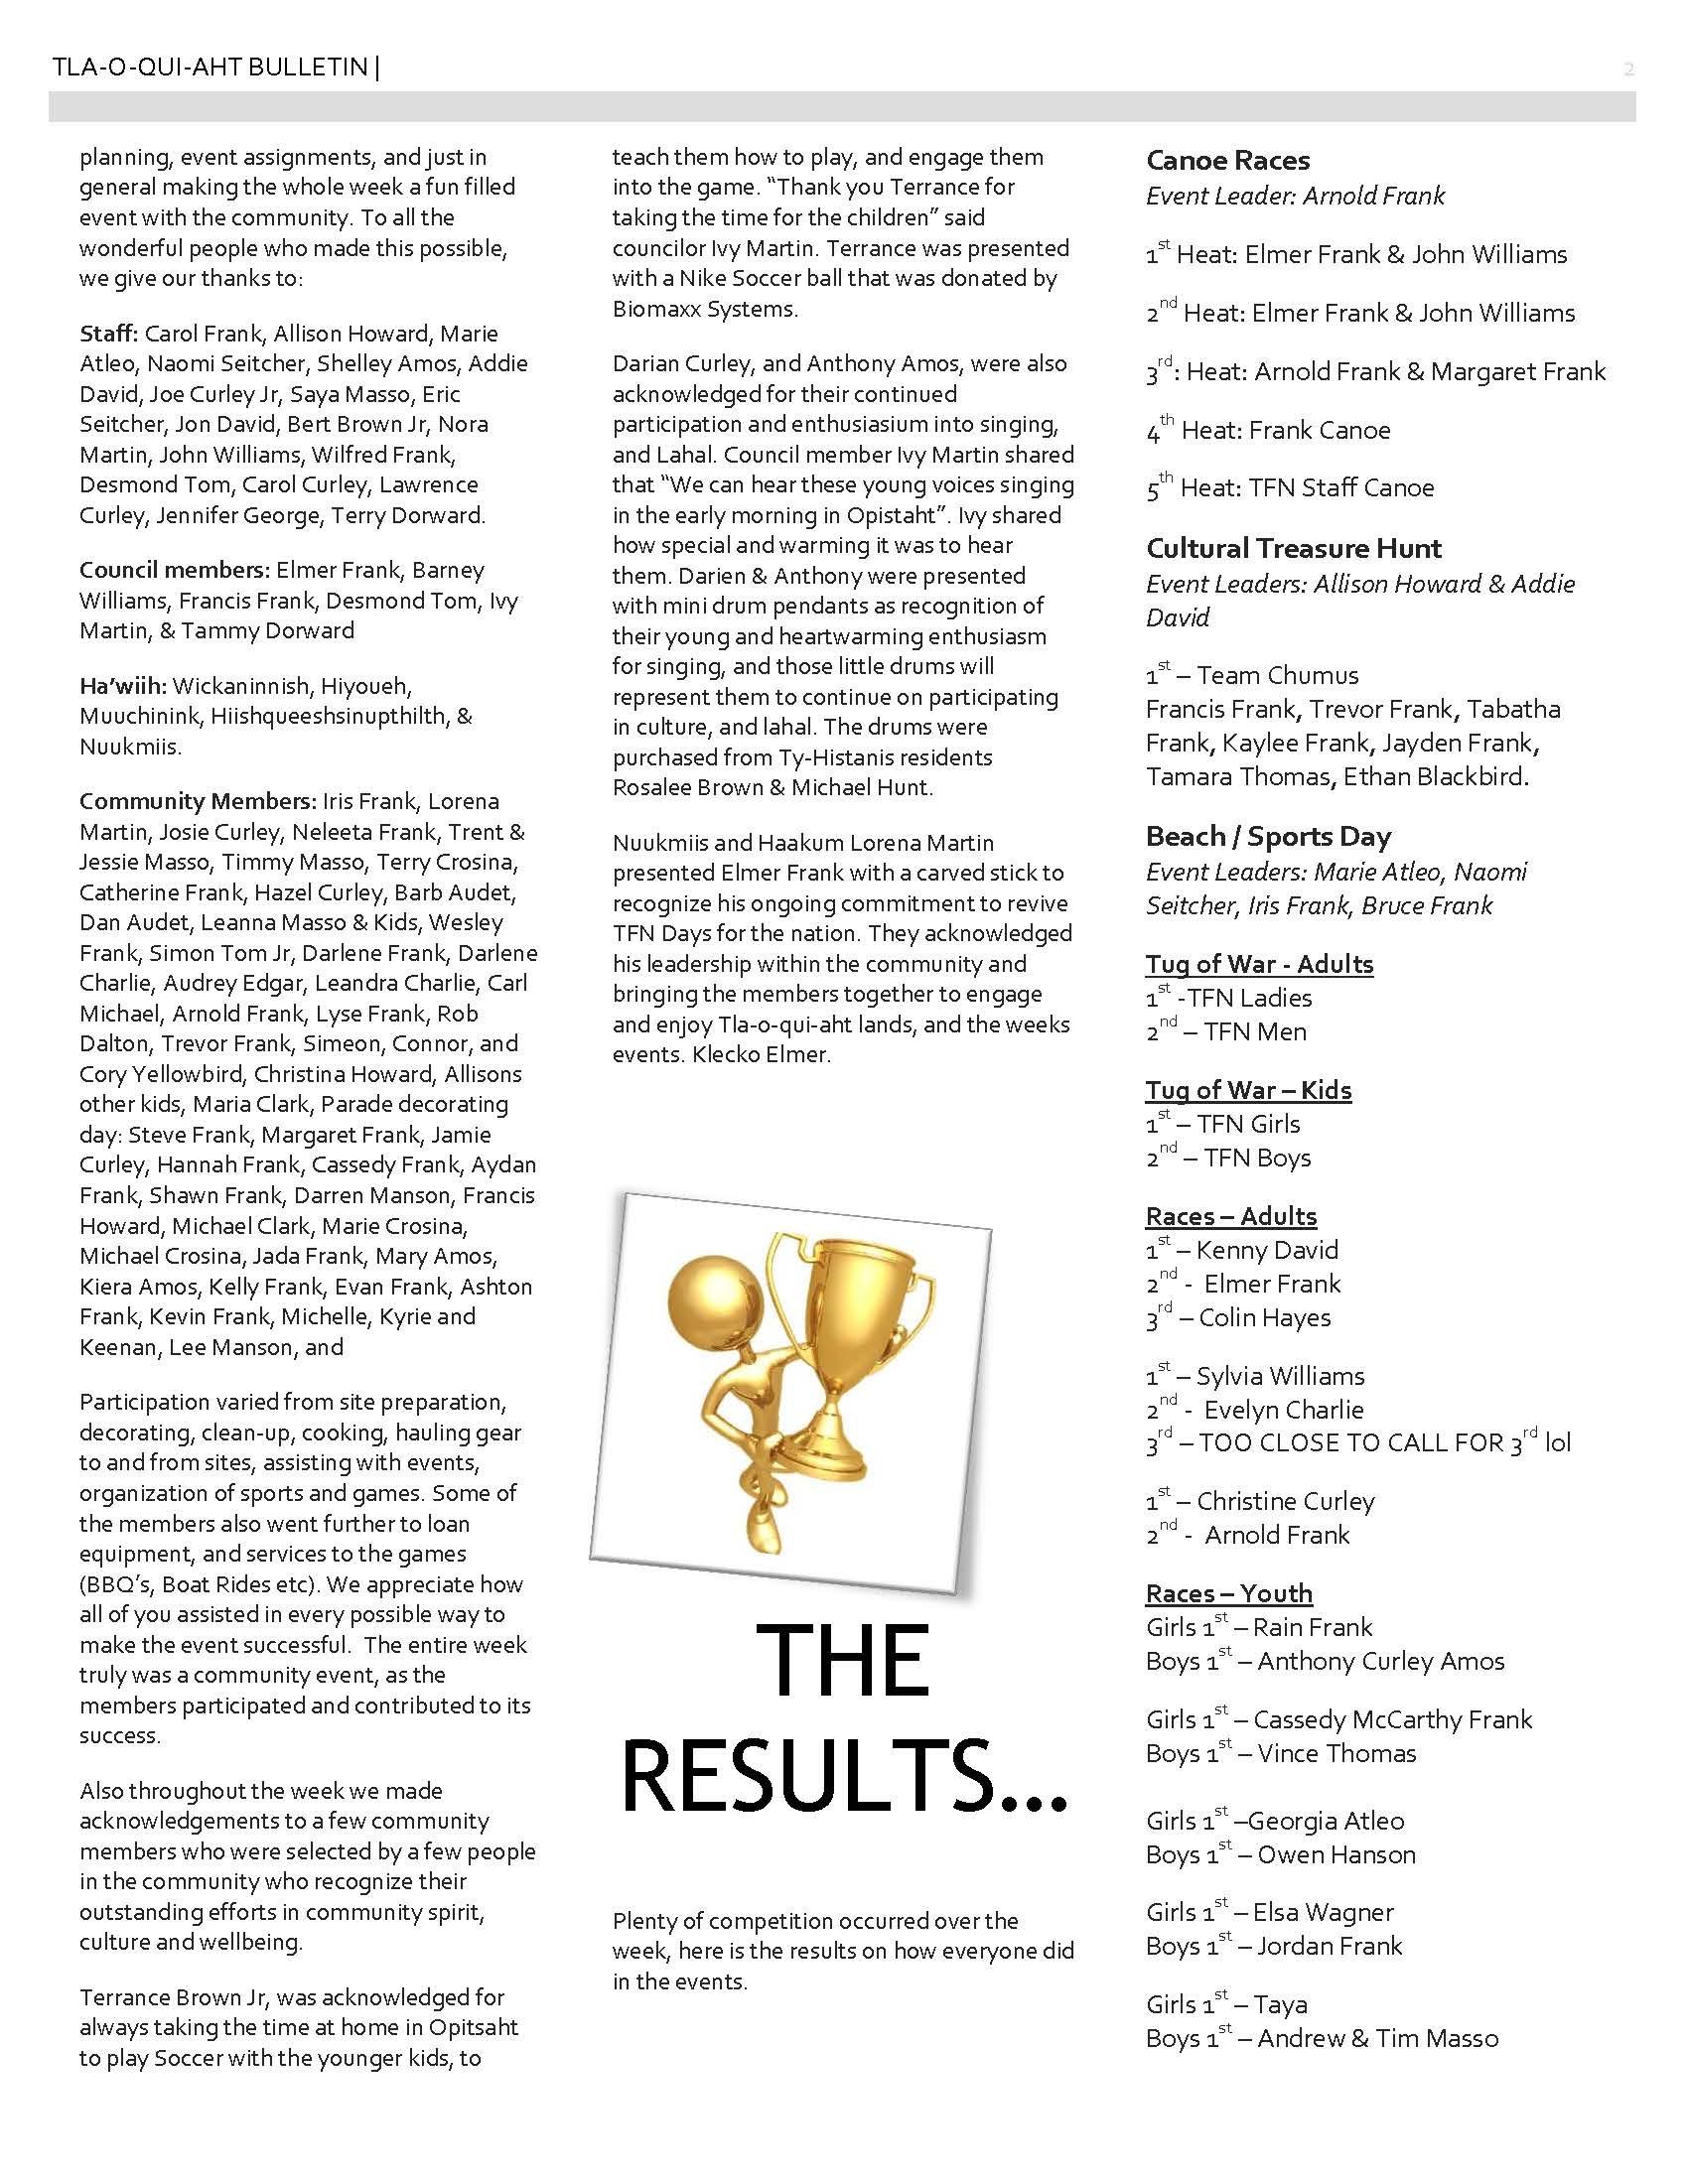 TFN Bulletin Sept 1-2016_Page_02.jpg